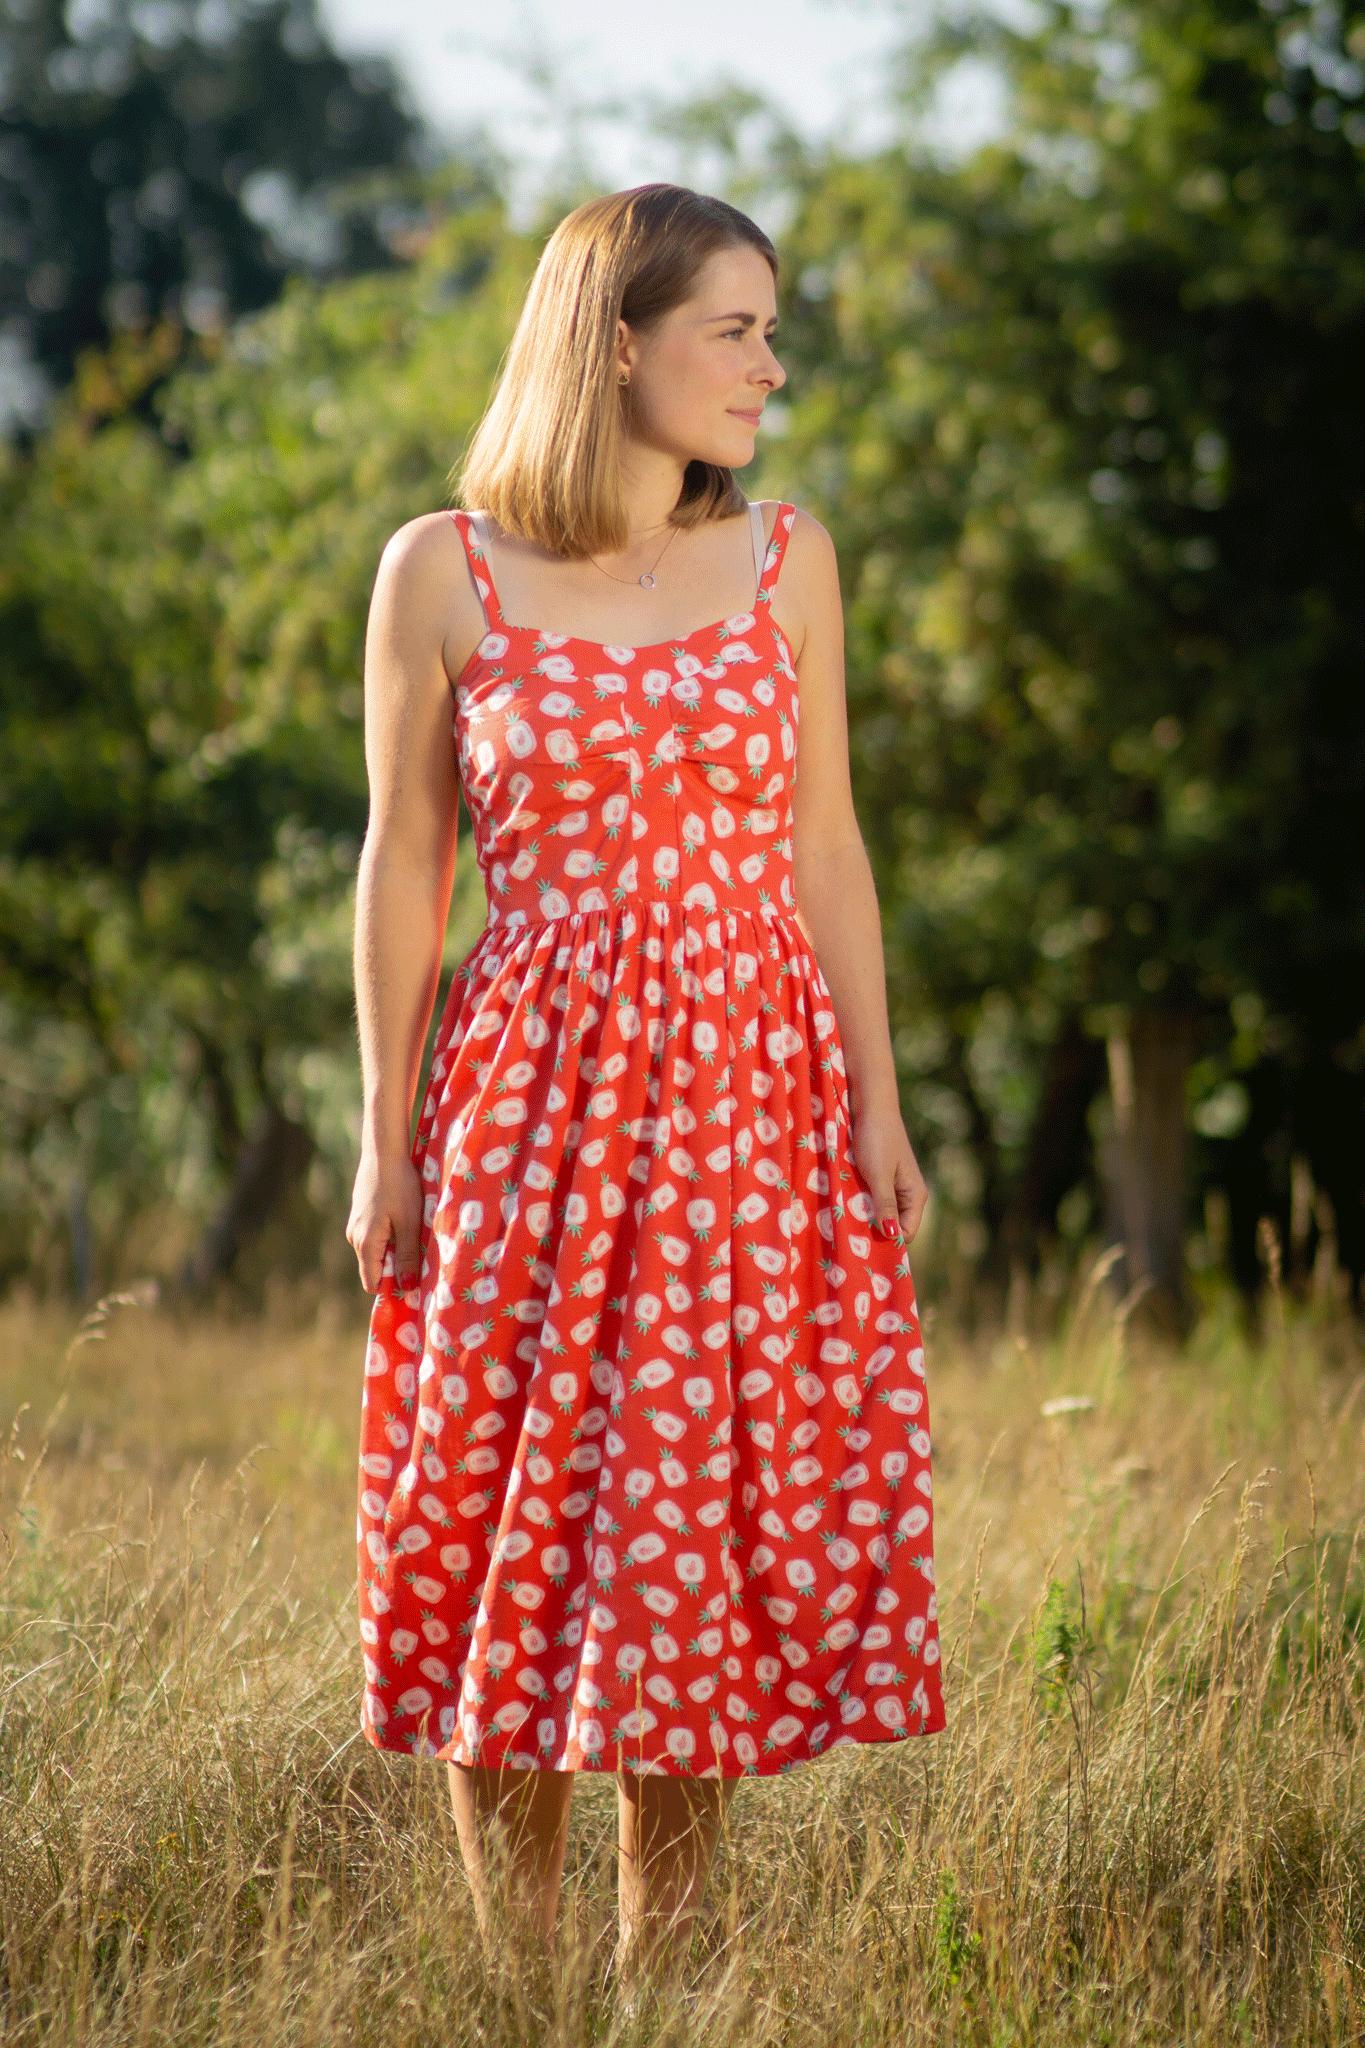 Fruchtige - Styles: Midi - Kleid mit Ananas - Print